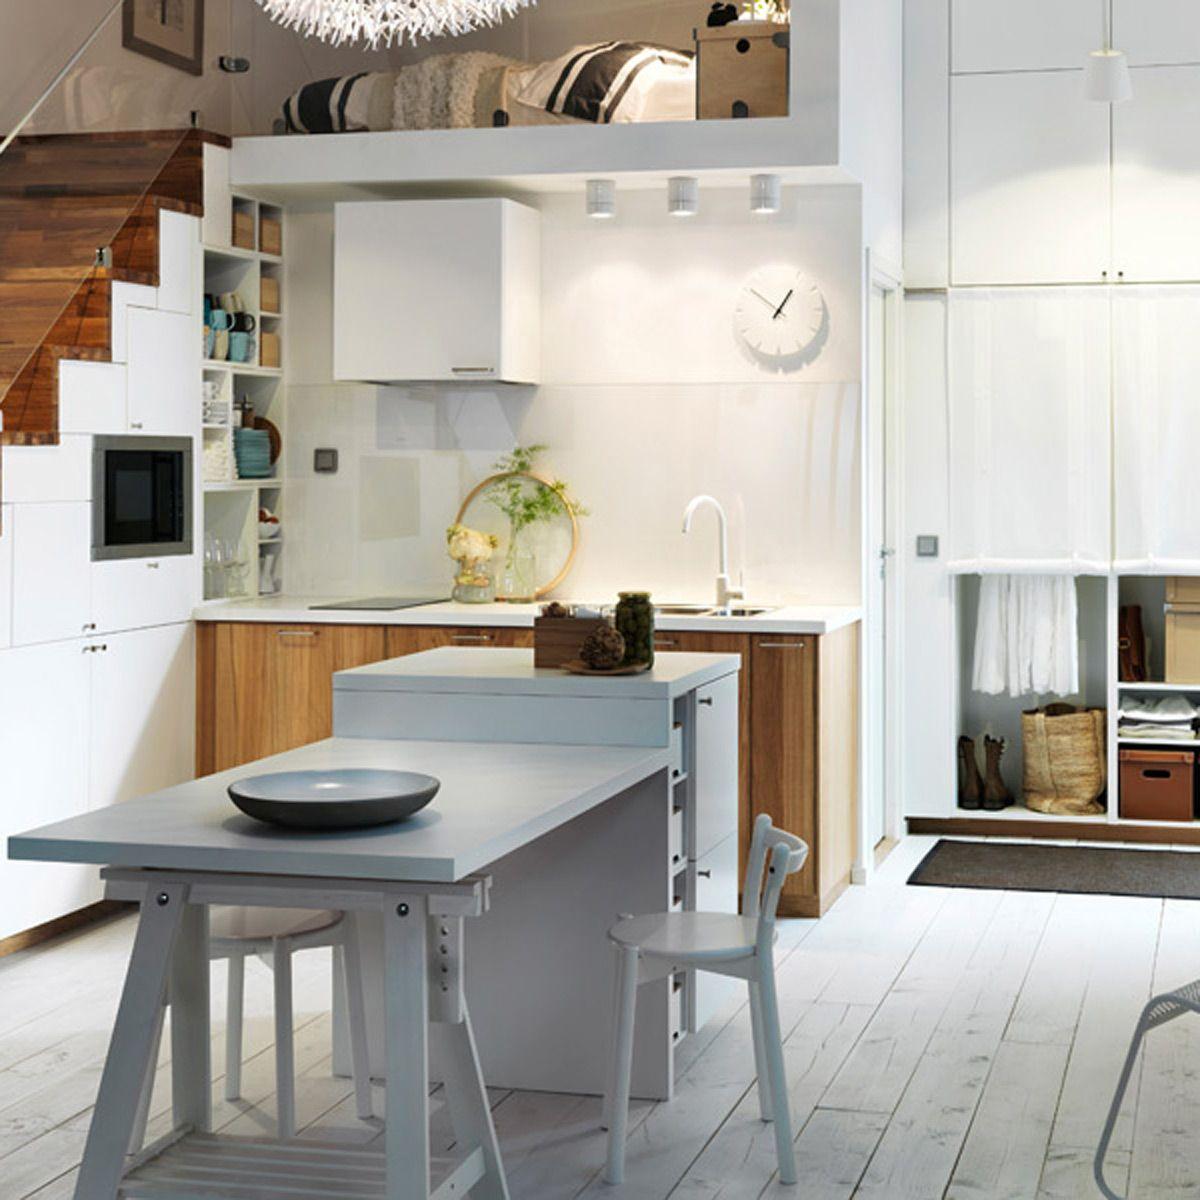 5 original space saving kitchen storage ideas modern kitchen design kitchen design small on kitchen organization small apartment id=85363